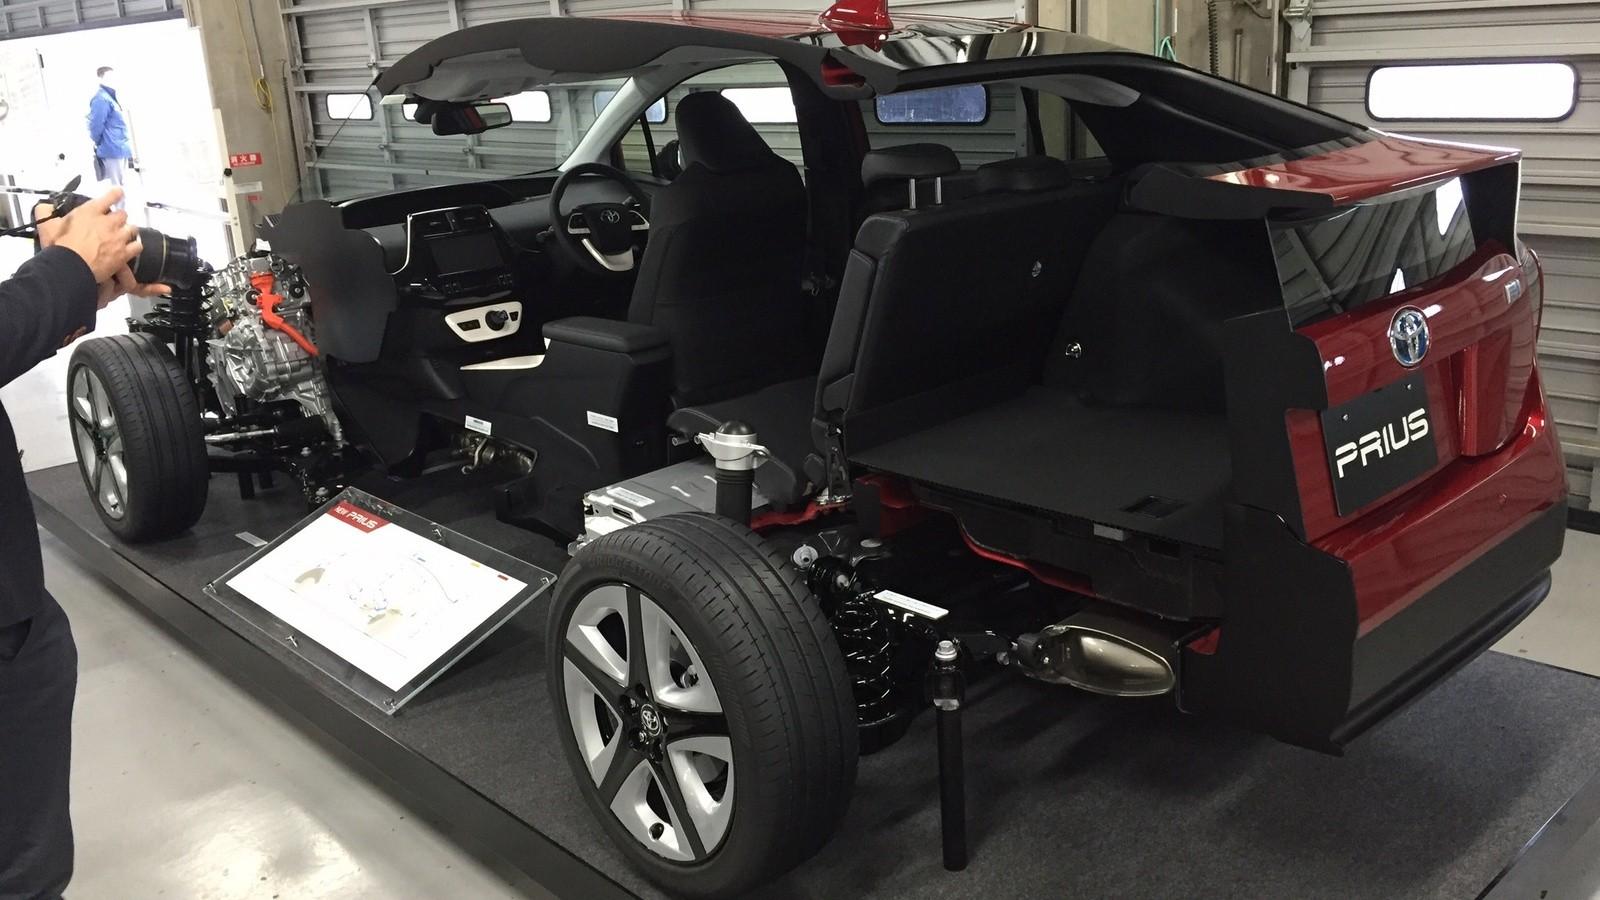 На фото: Автомобиль Toyota Prius с платформой TNGA, Токийский автосалон 2016 года